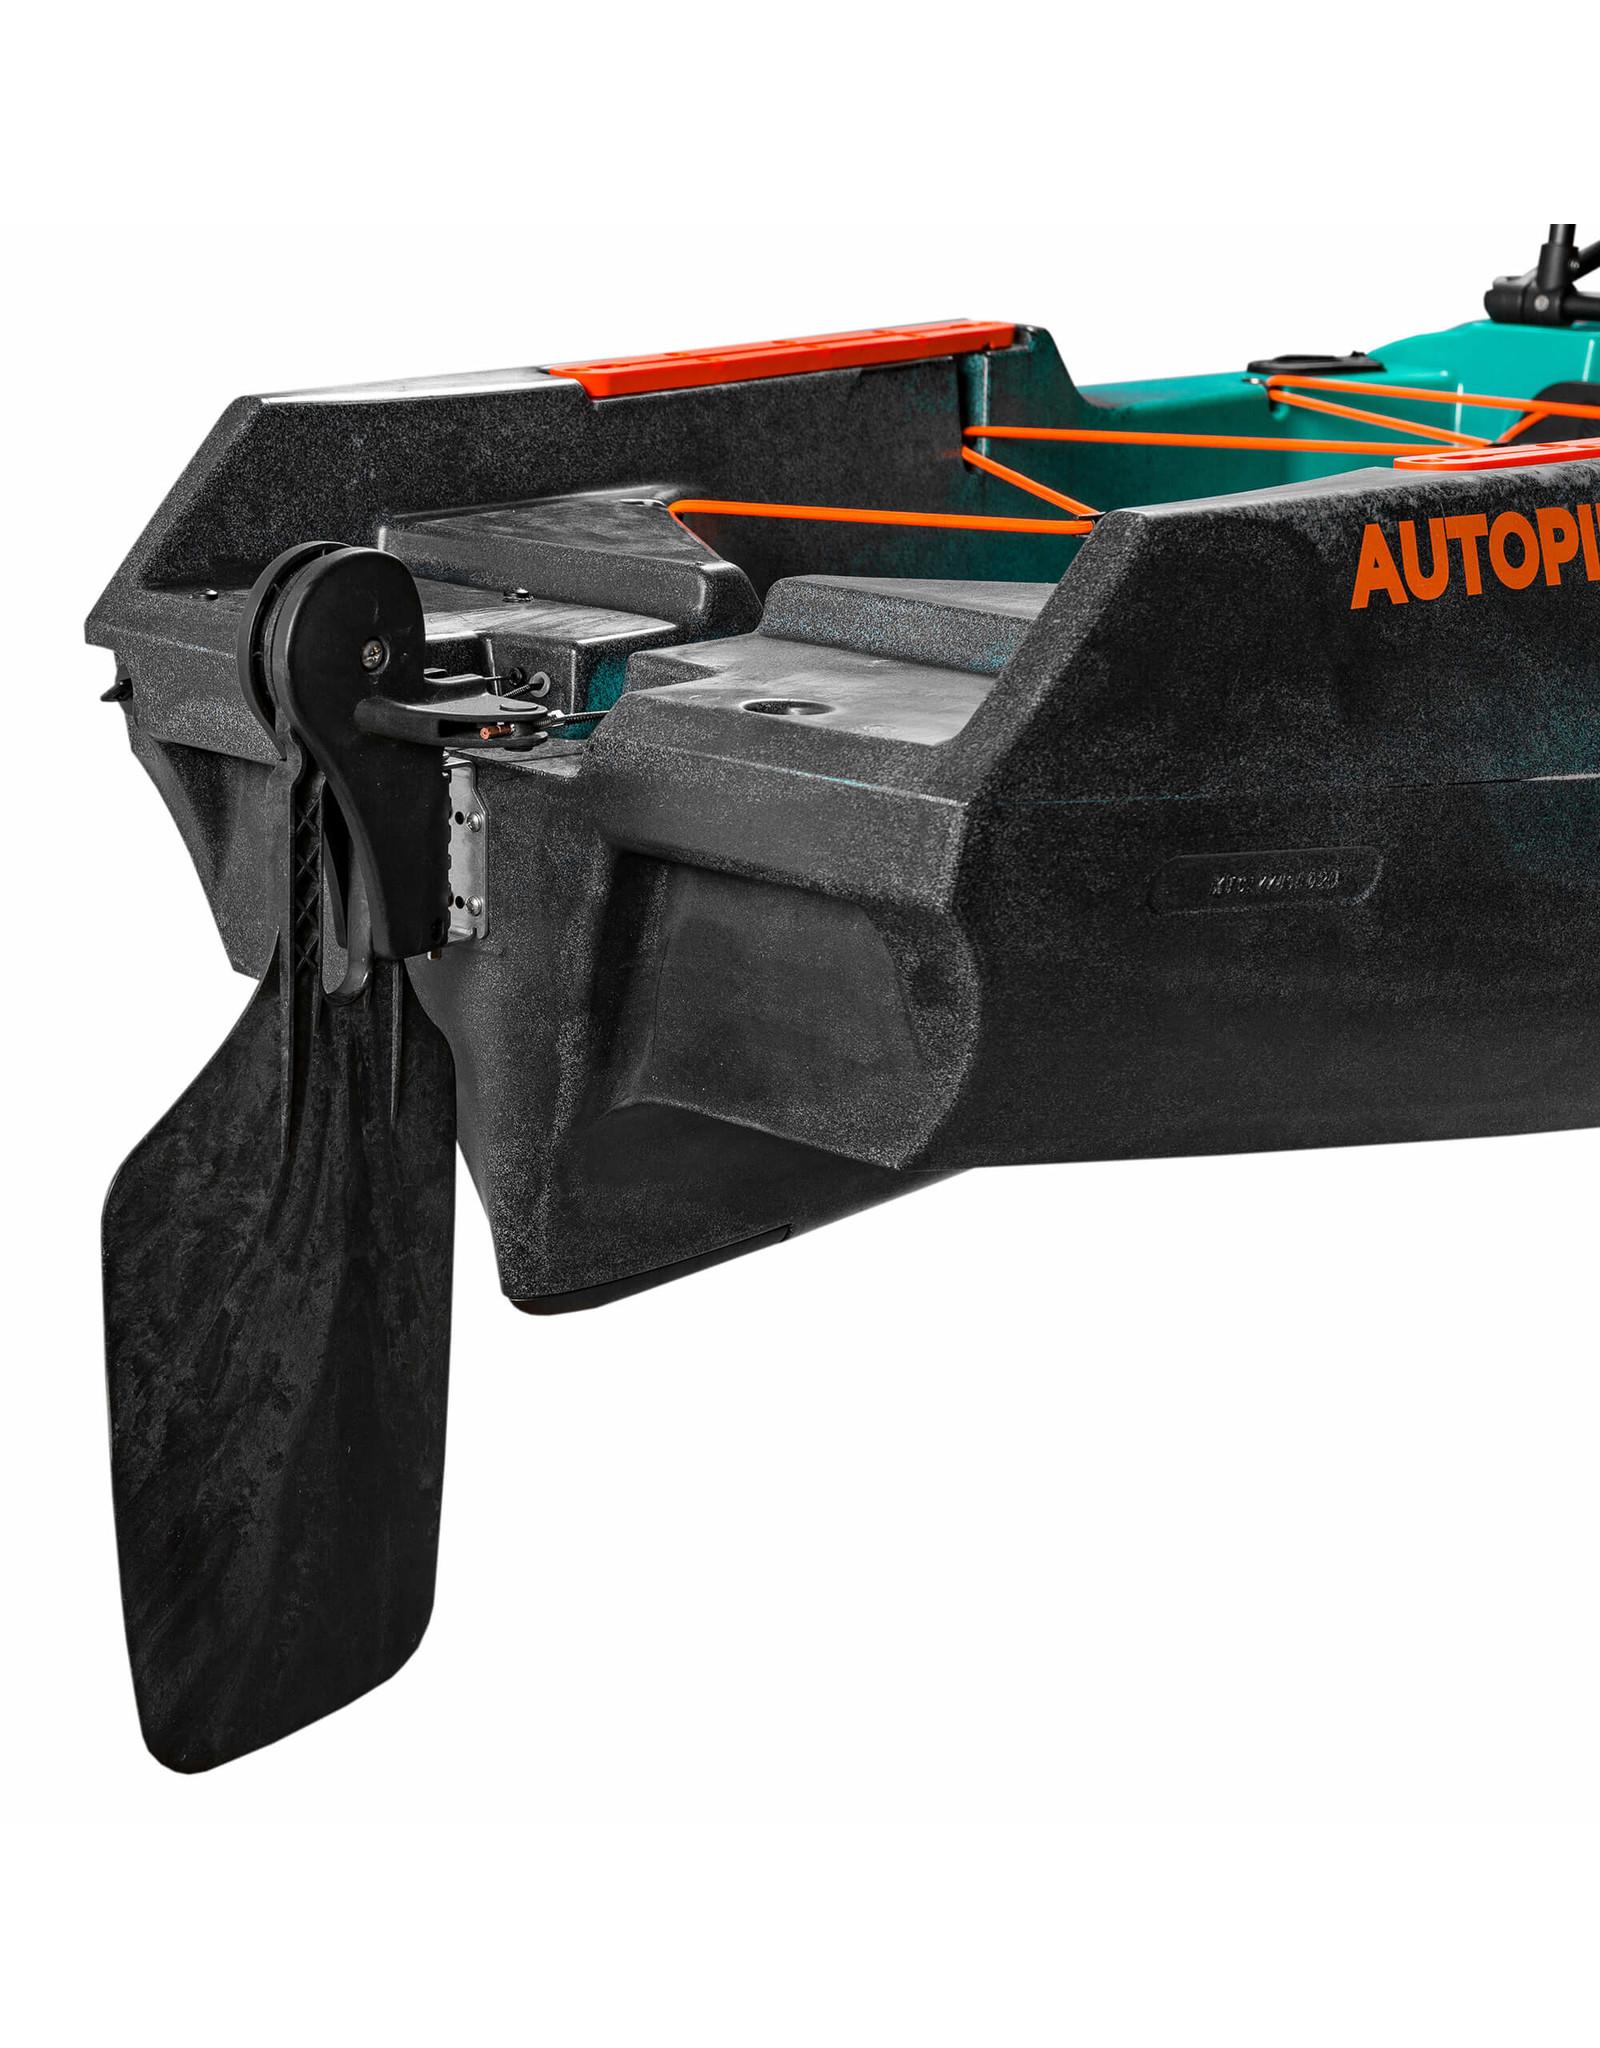 Old Town Old Town kayak Sportman AutoPilot 120